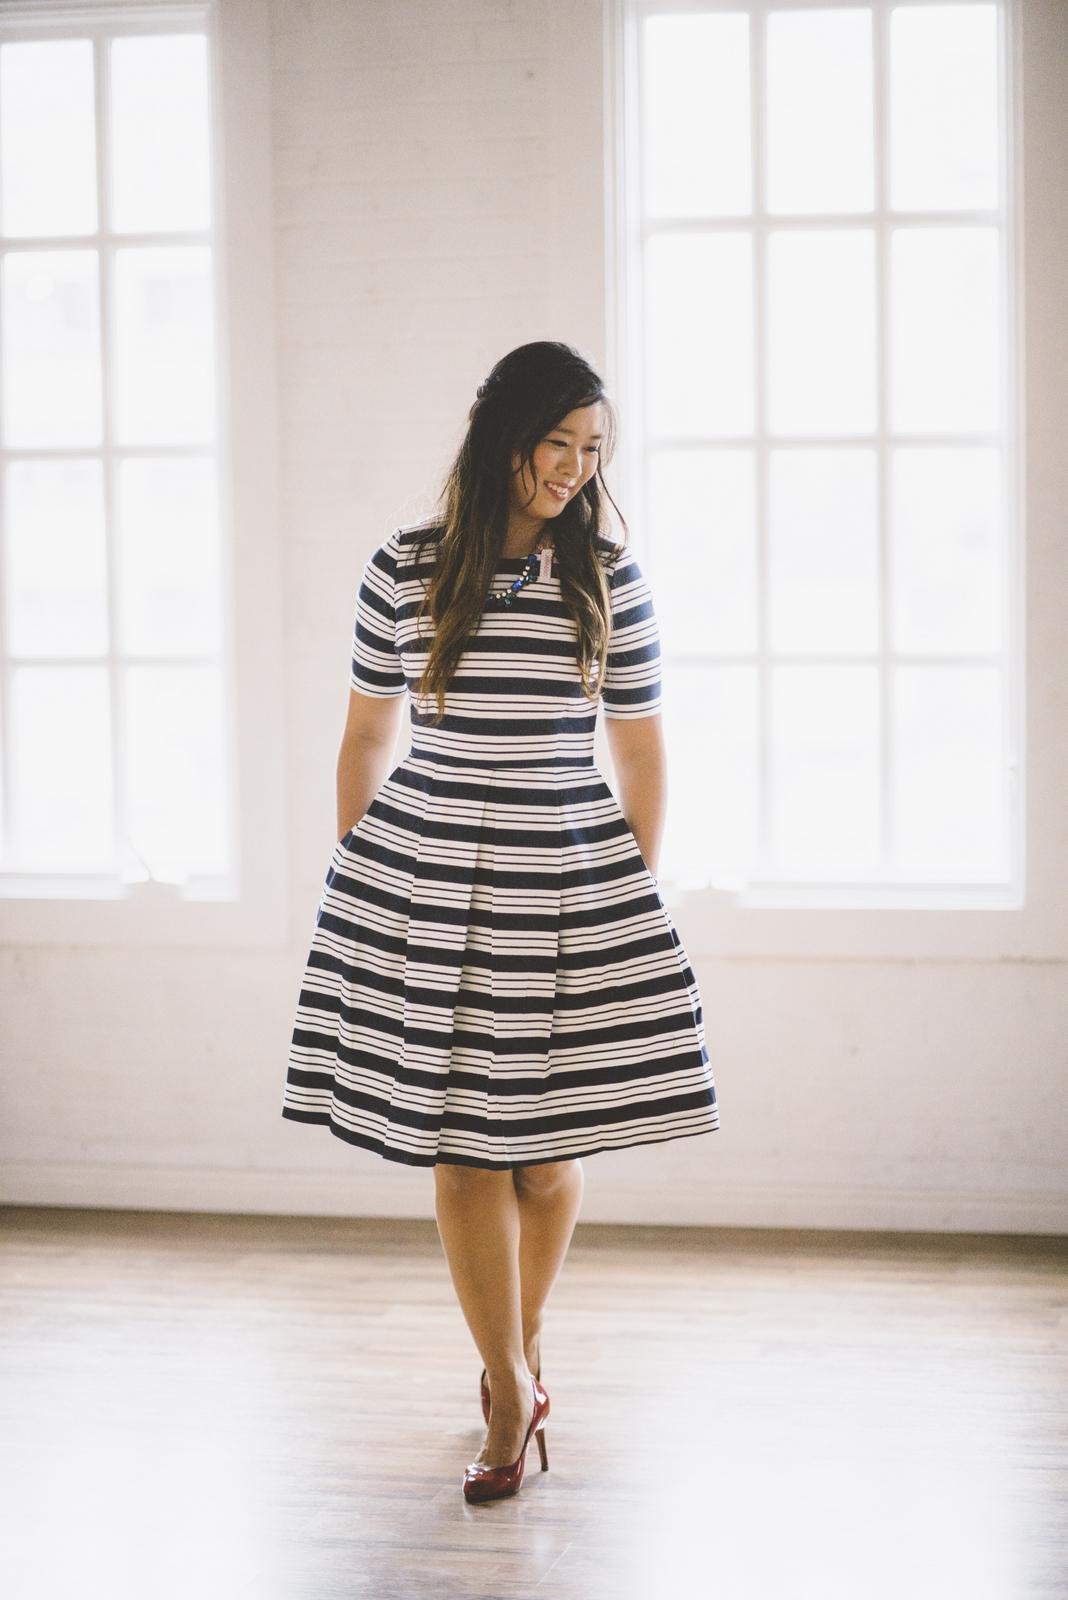 Downeast Basics striped dress